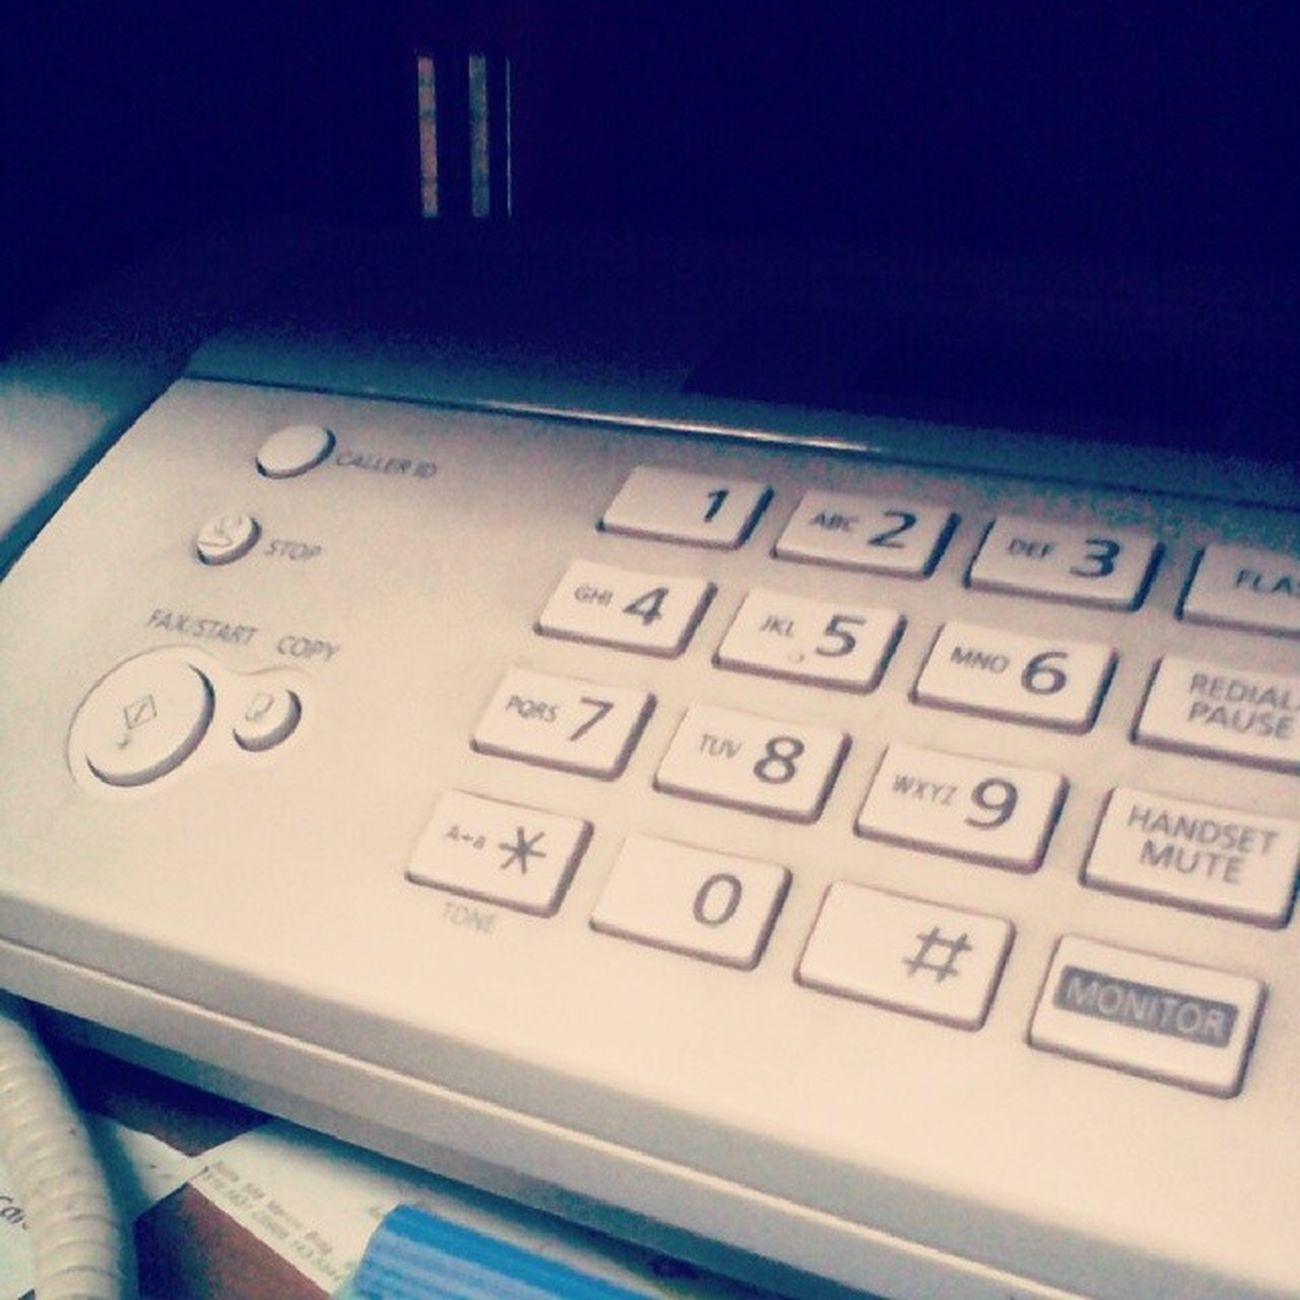 Telepax number is (63 36) 288 1759 @ BoracayOceanBayResortAndCafé